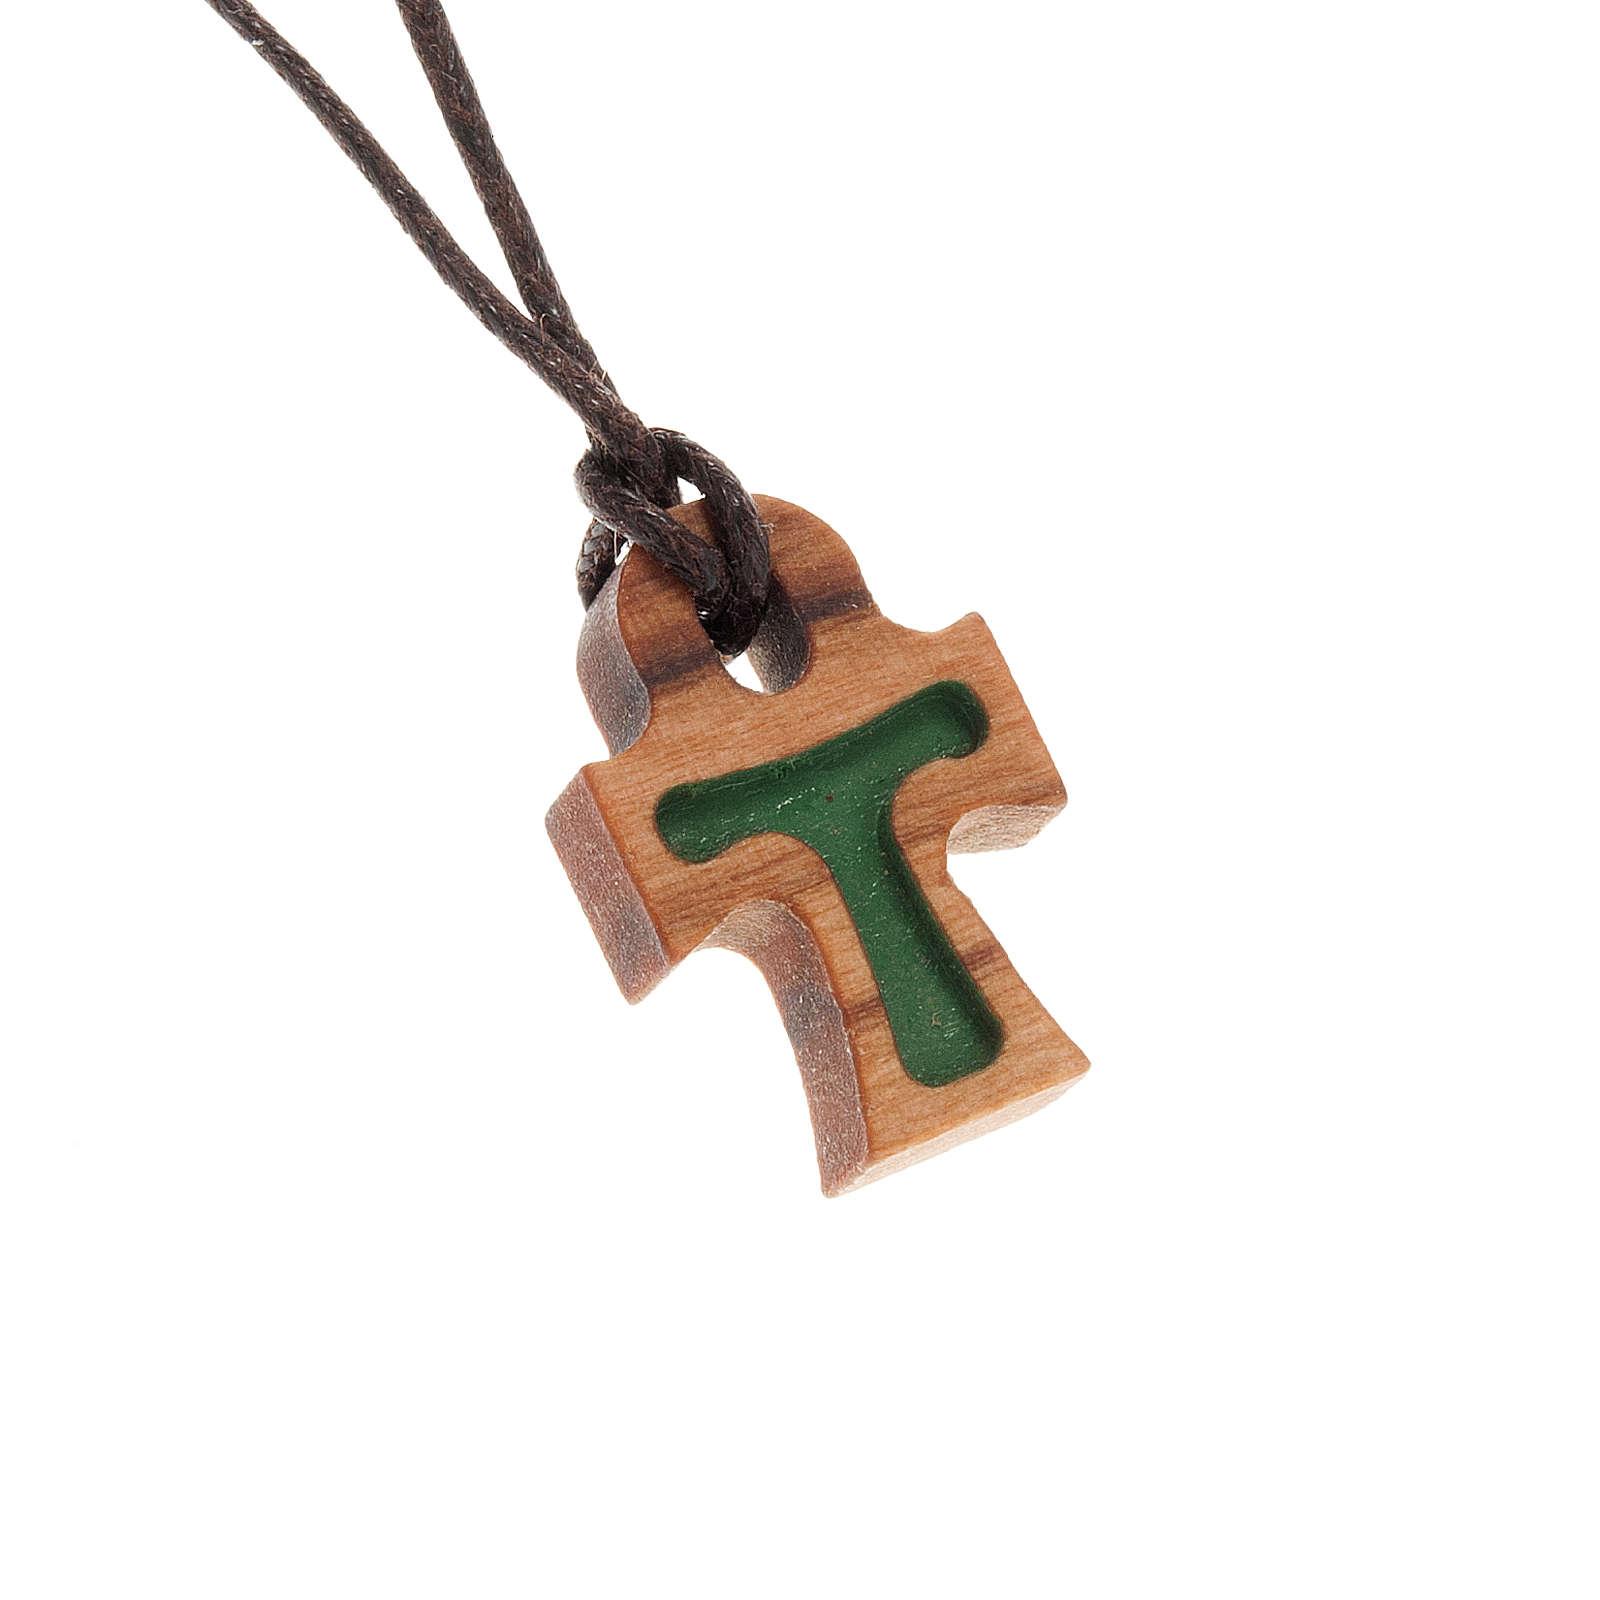 Croix en forme de tau verte bois d'olivier 4